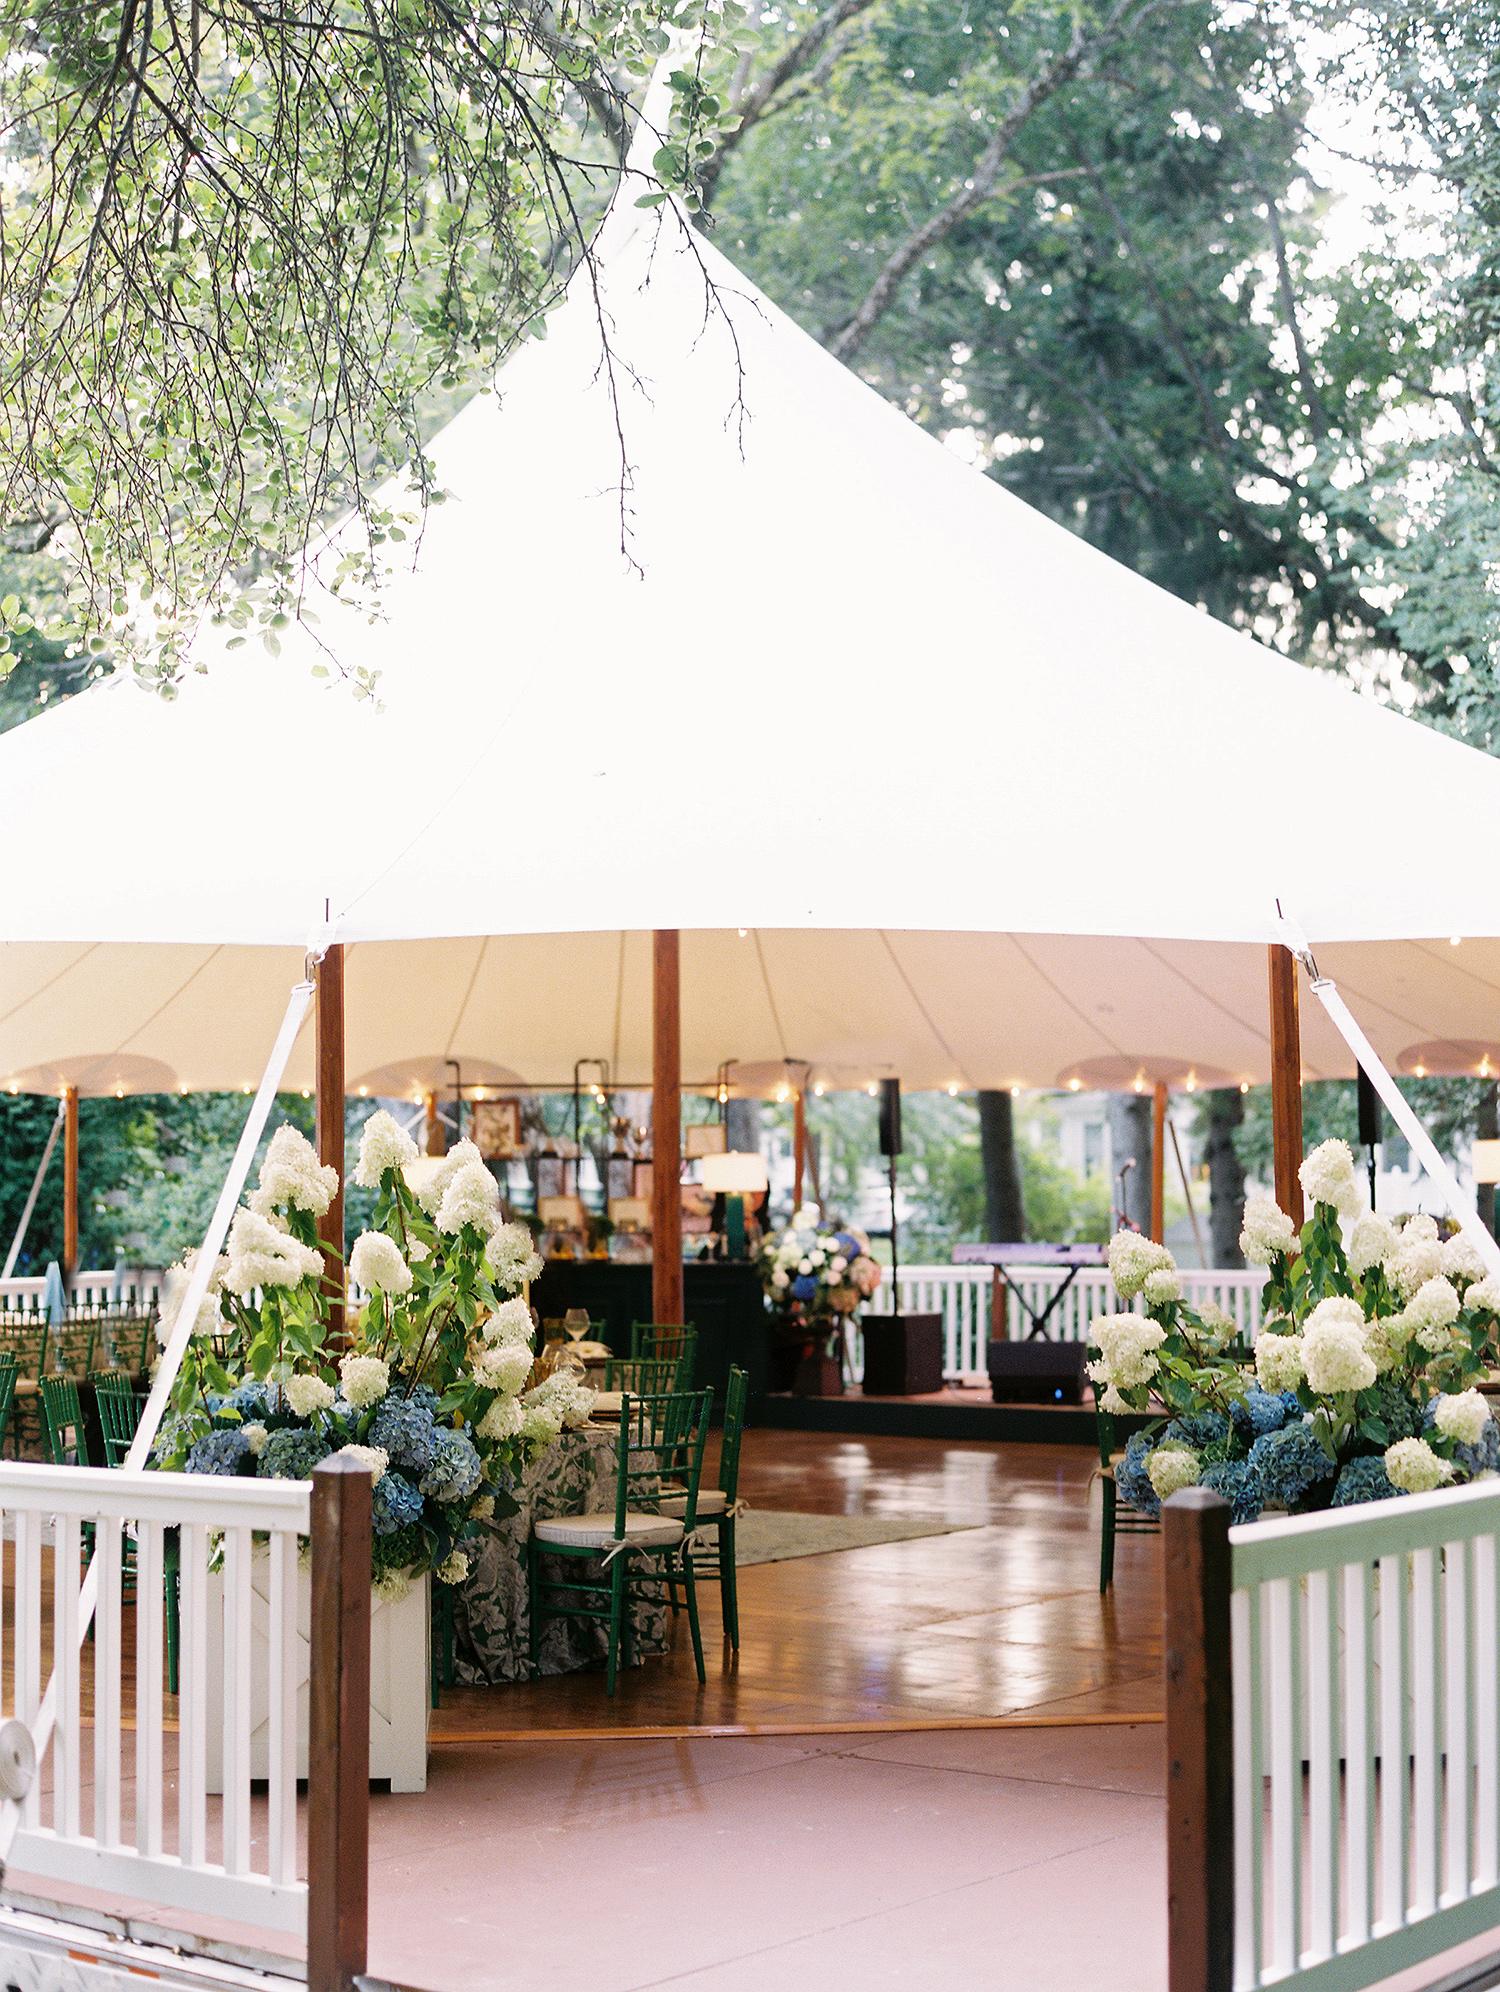 charles andrew wedding reception tent